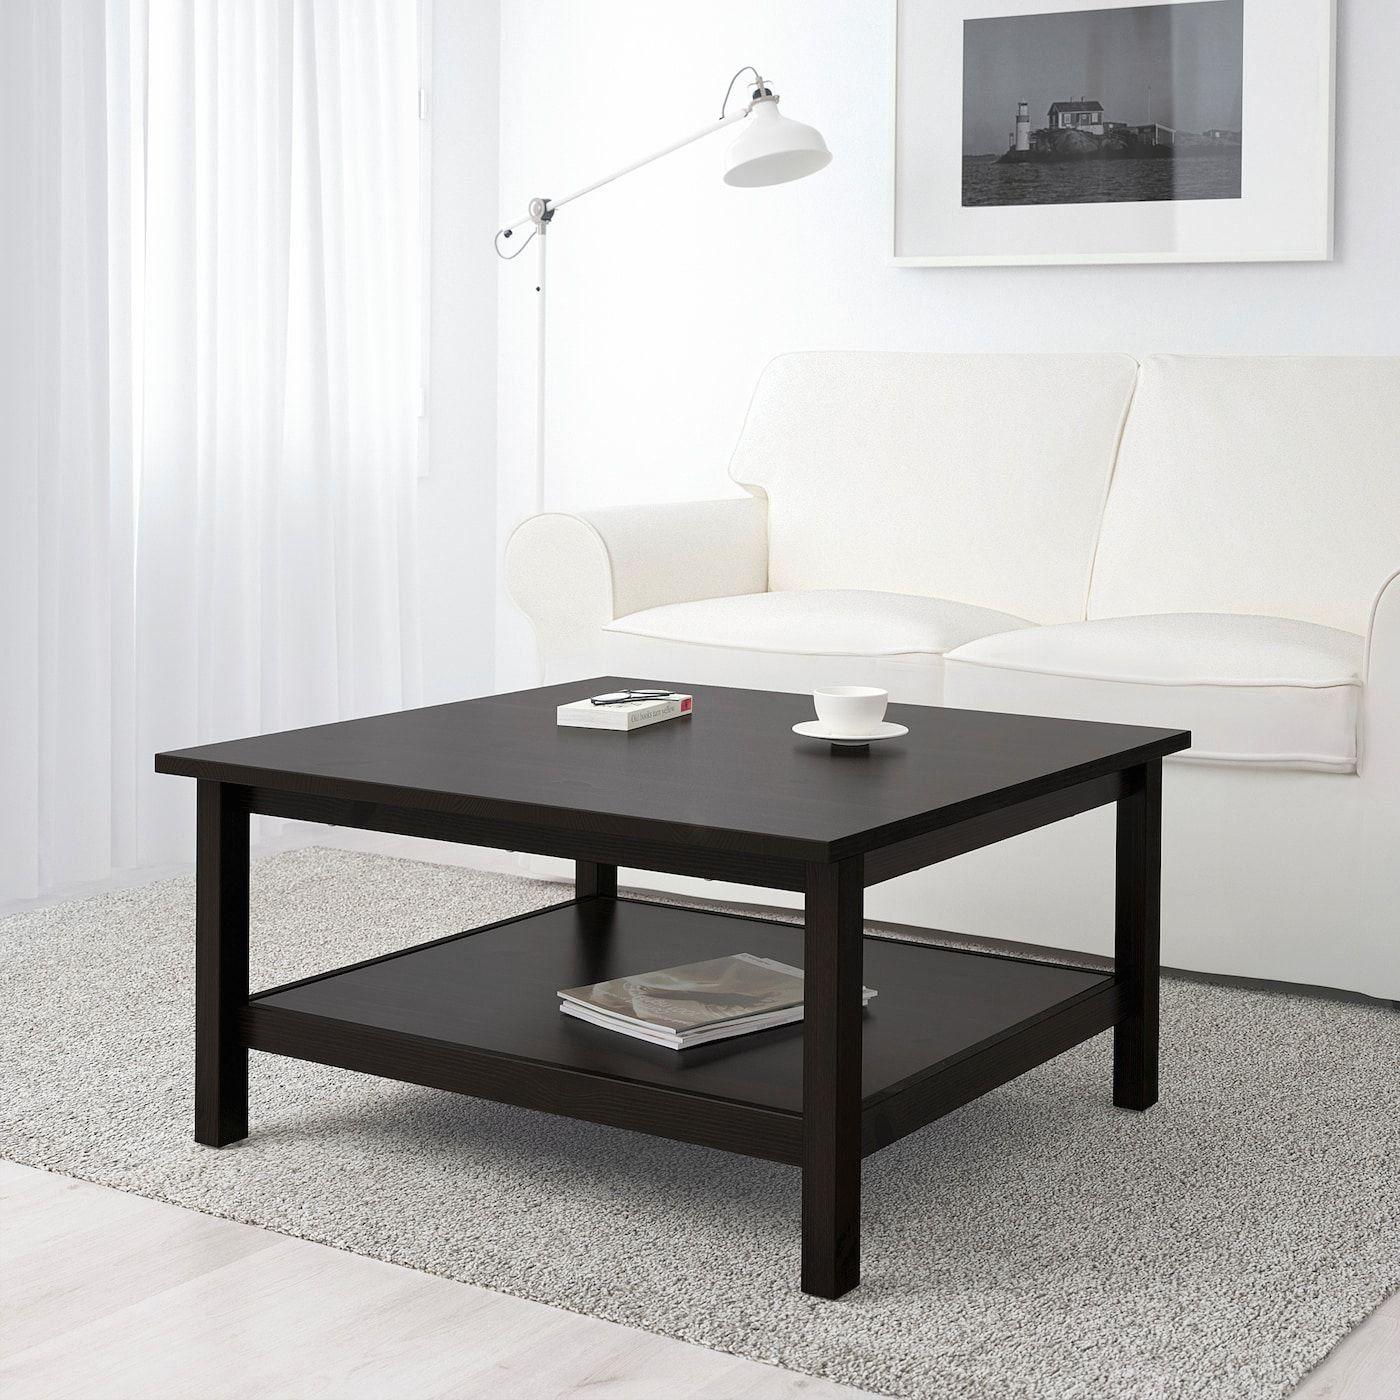 Park Art|My WordPress Blog_Dark Brown Coffee Table Ikea